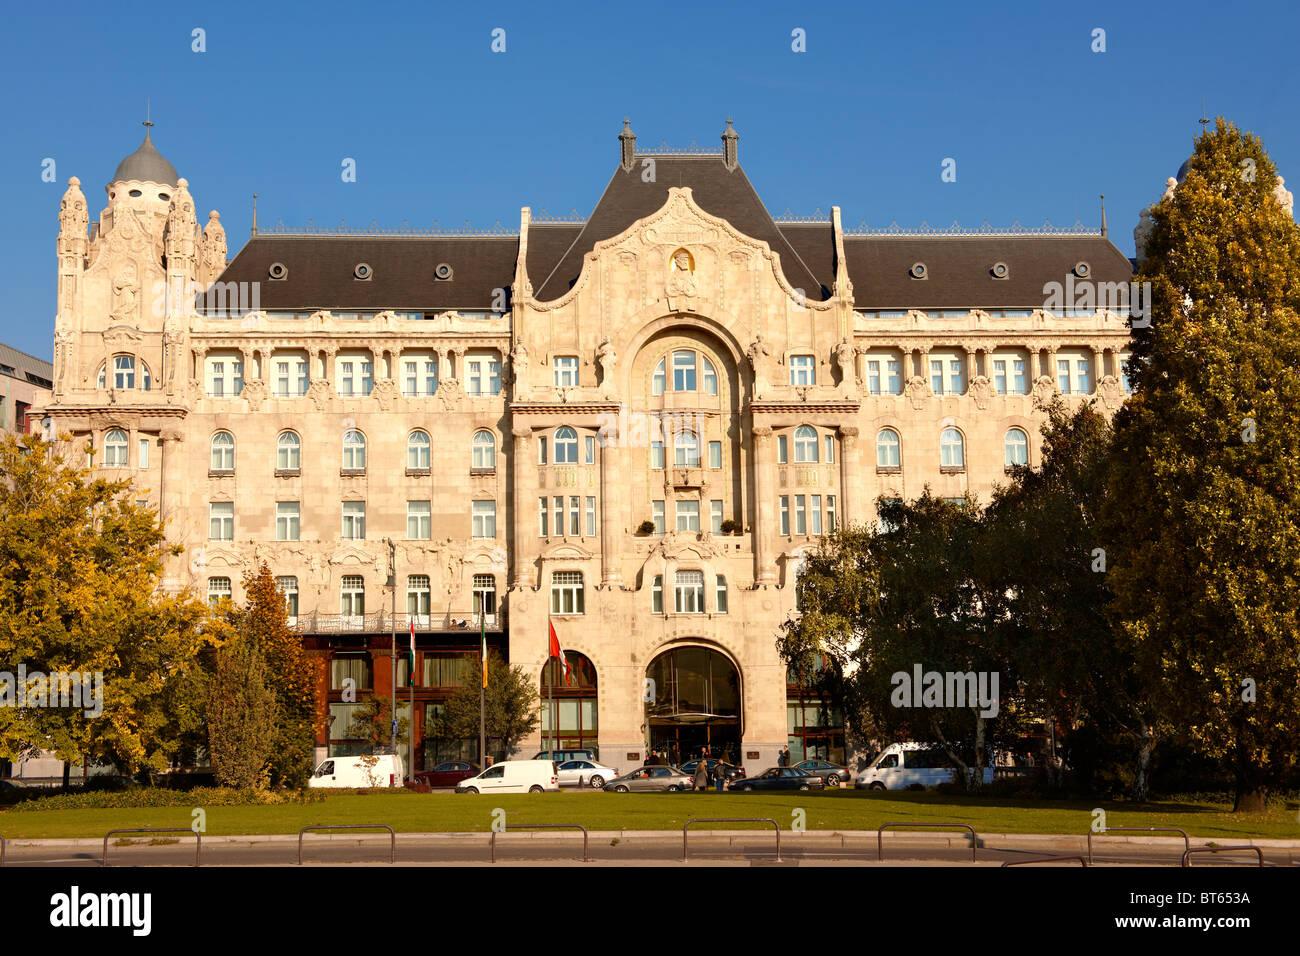 Four Seasons Hotel in The Art Nouveau Gresham Palace, Budapest, Hungary Stock Photo